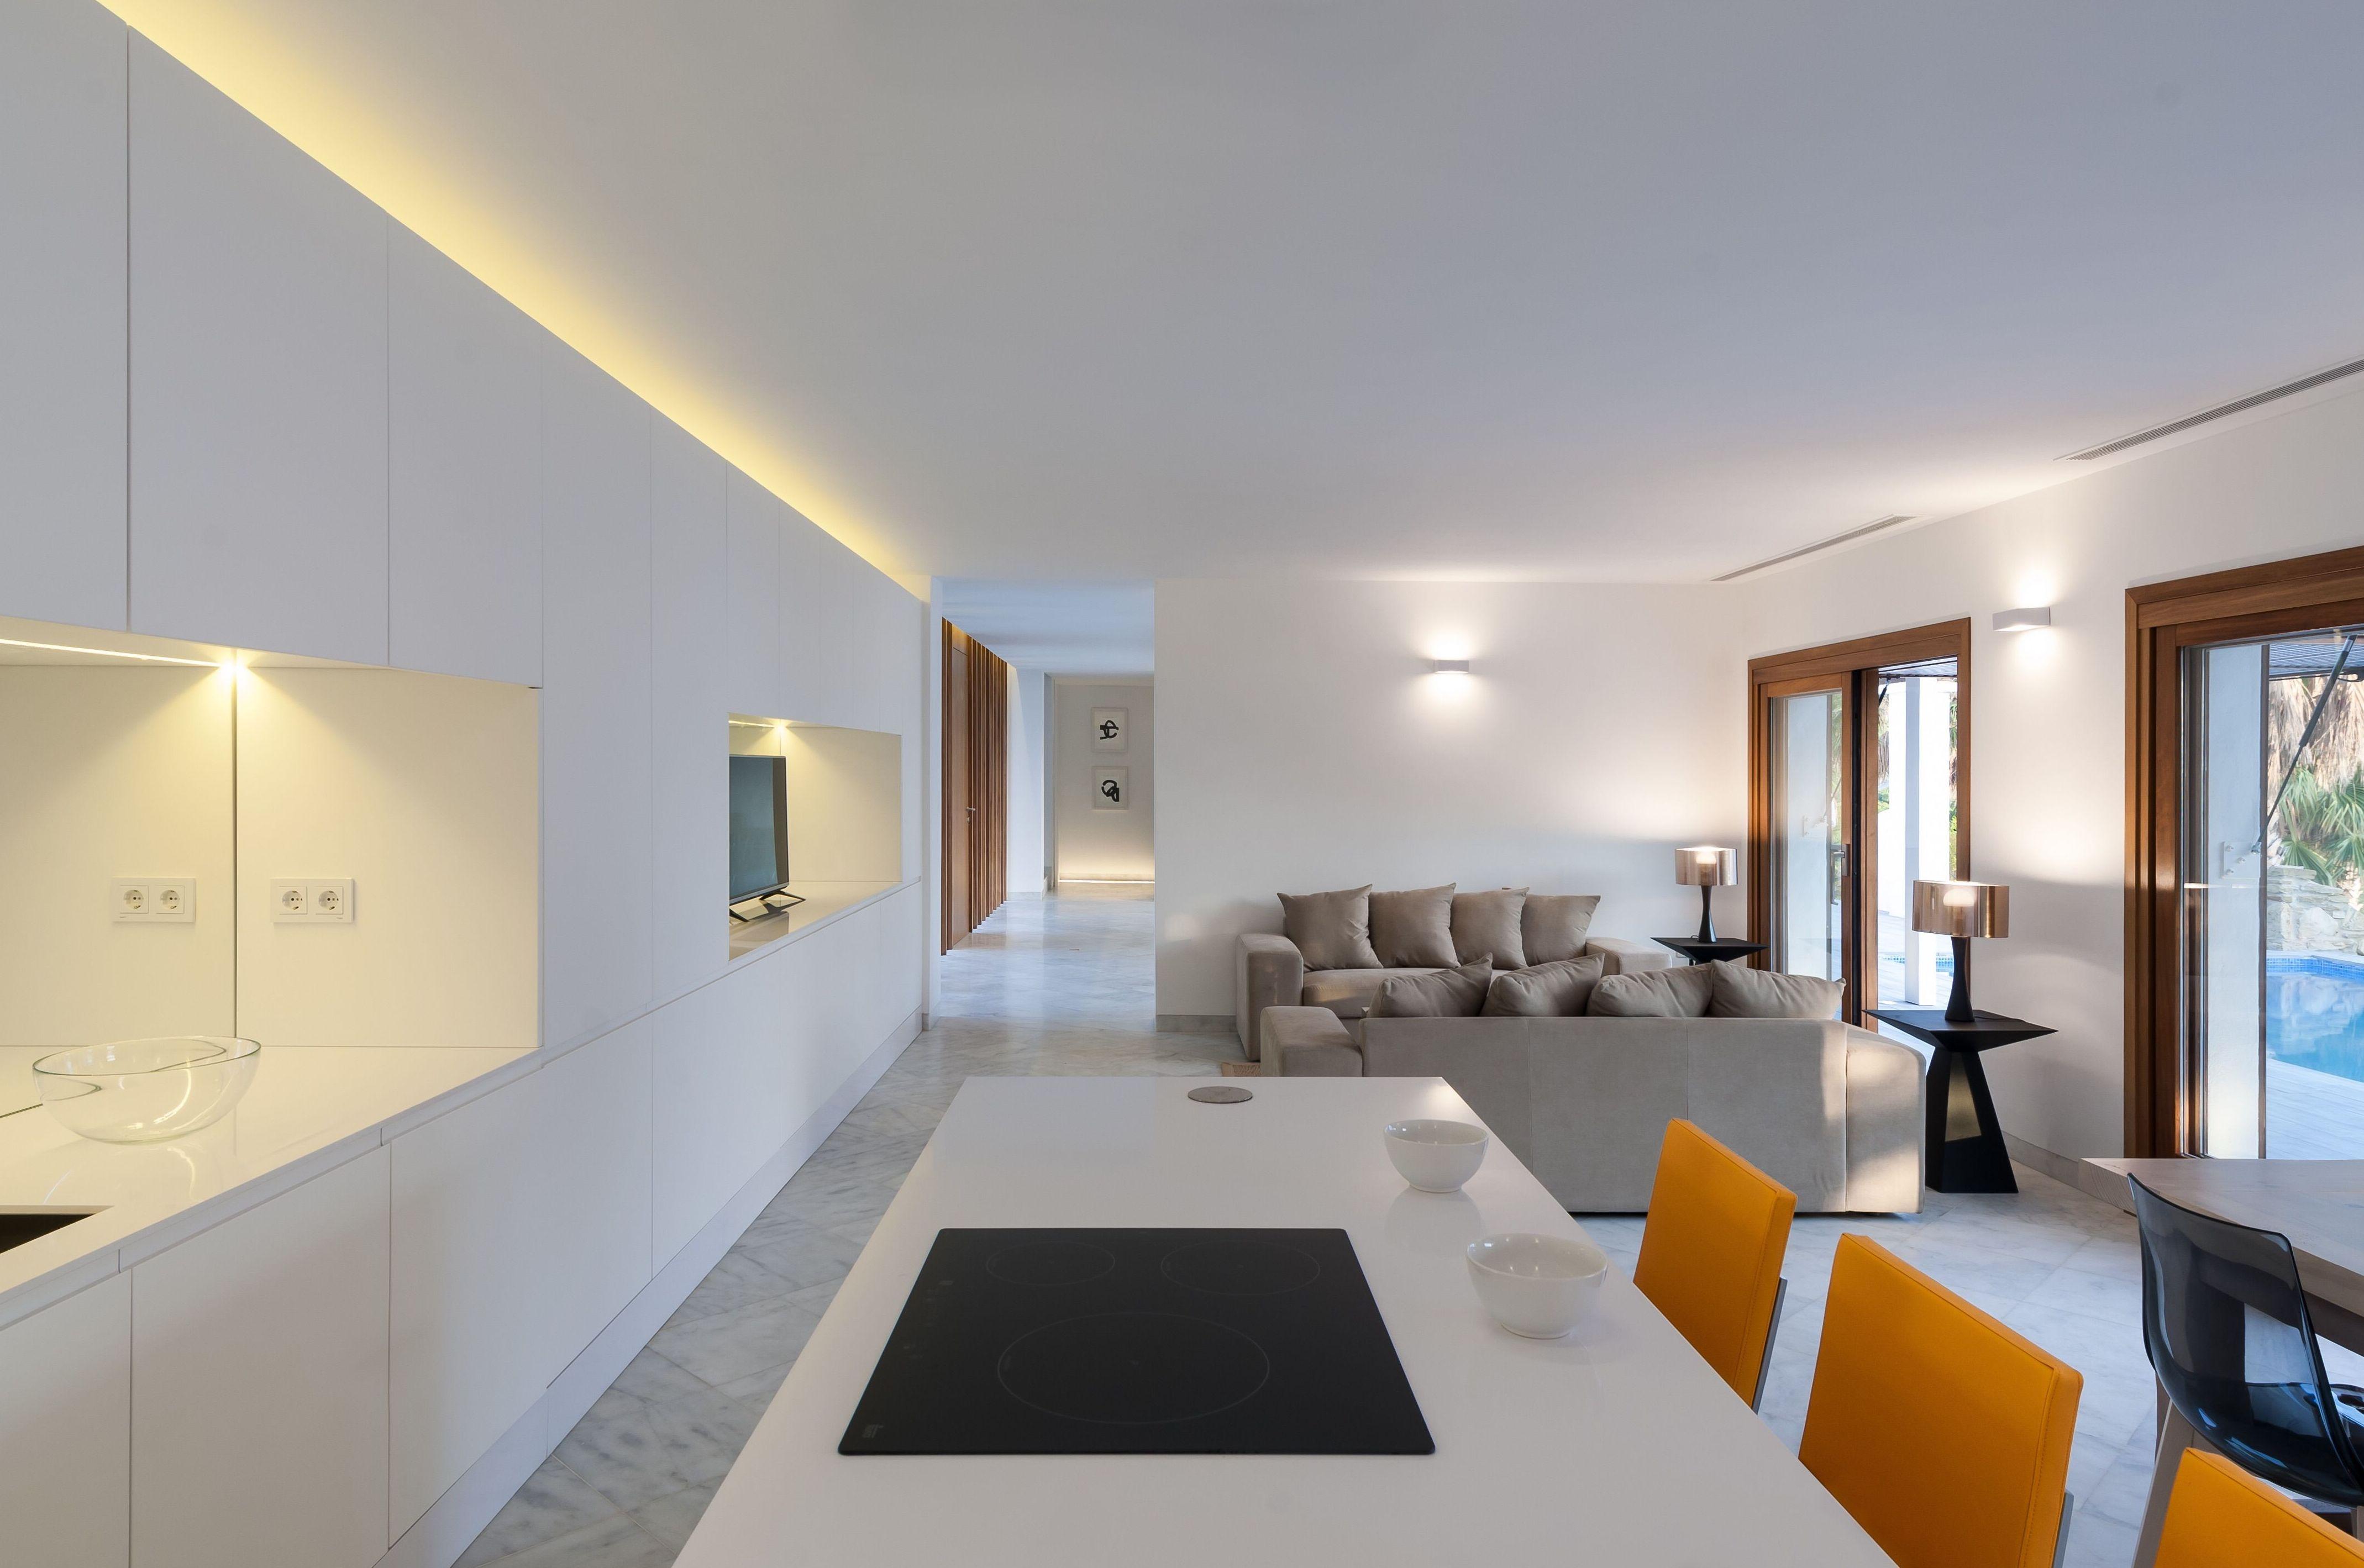 Proyectos de arquitectura en Cádiz